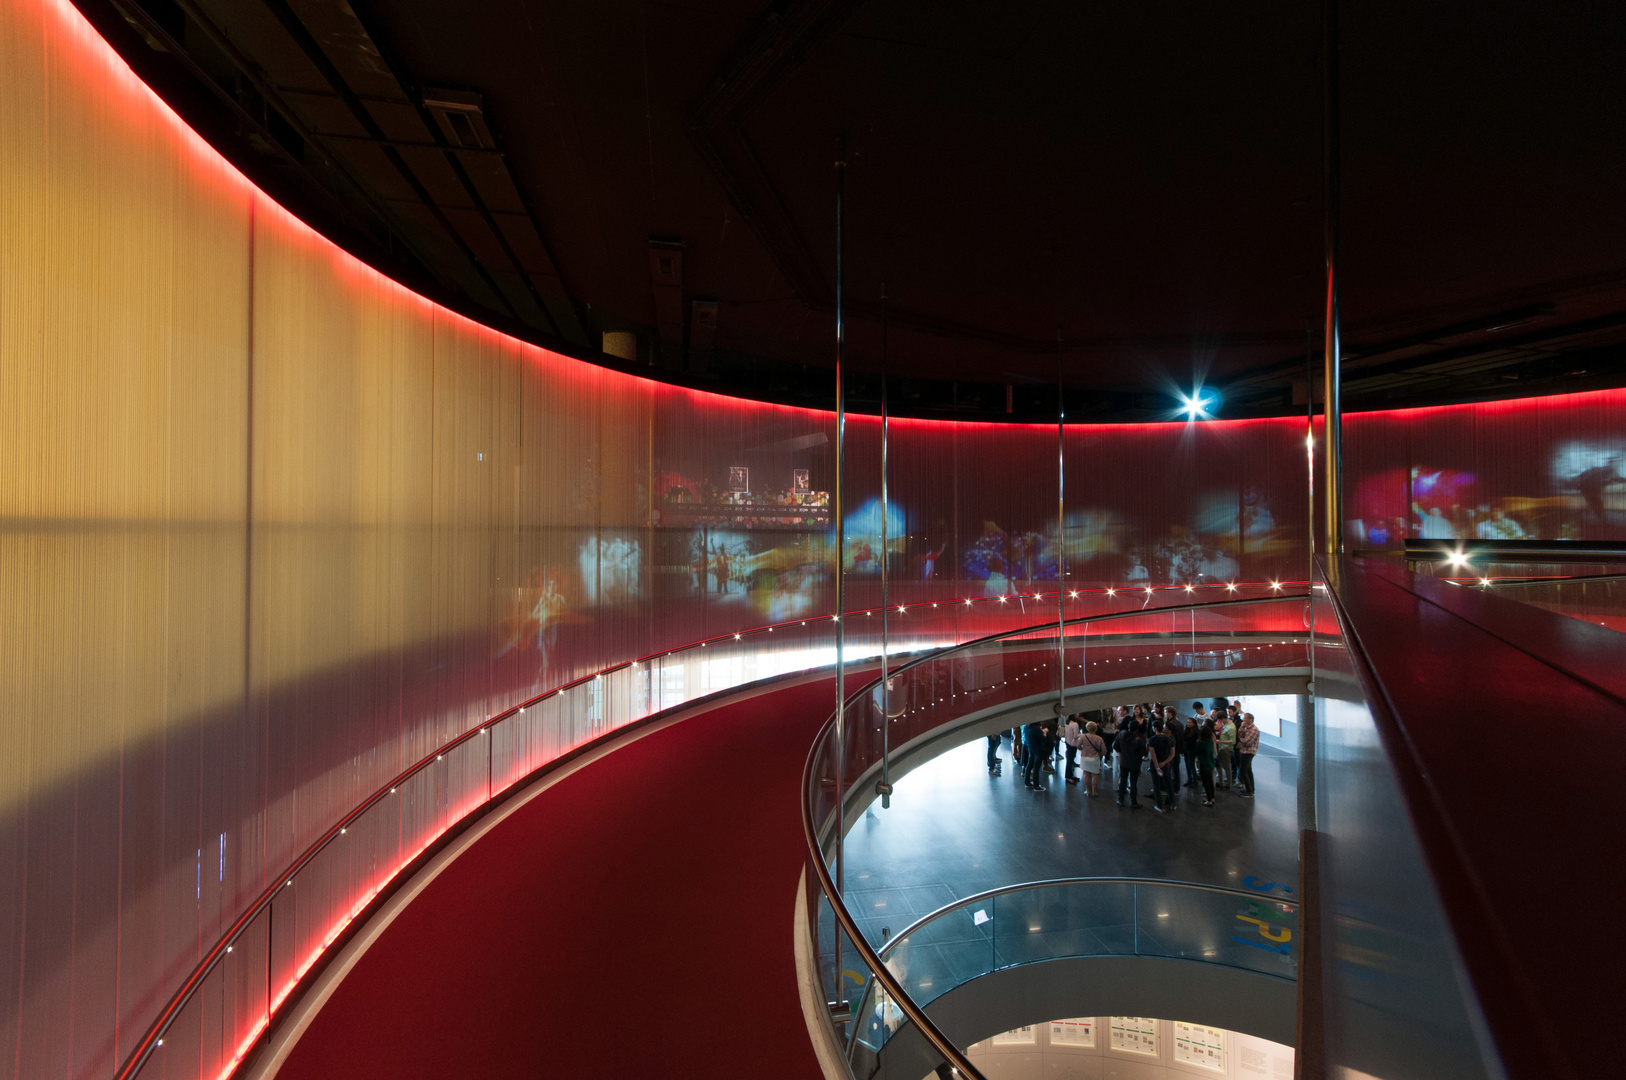 Olympisches Museum in Lausanne - Innenaufnahme